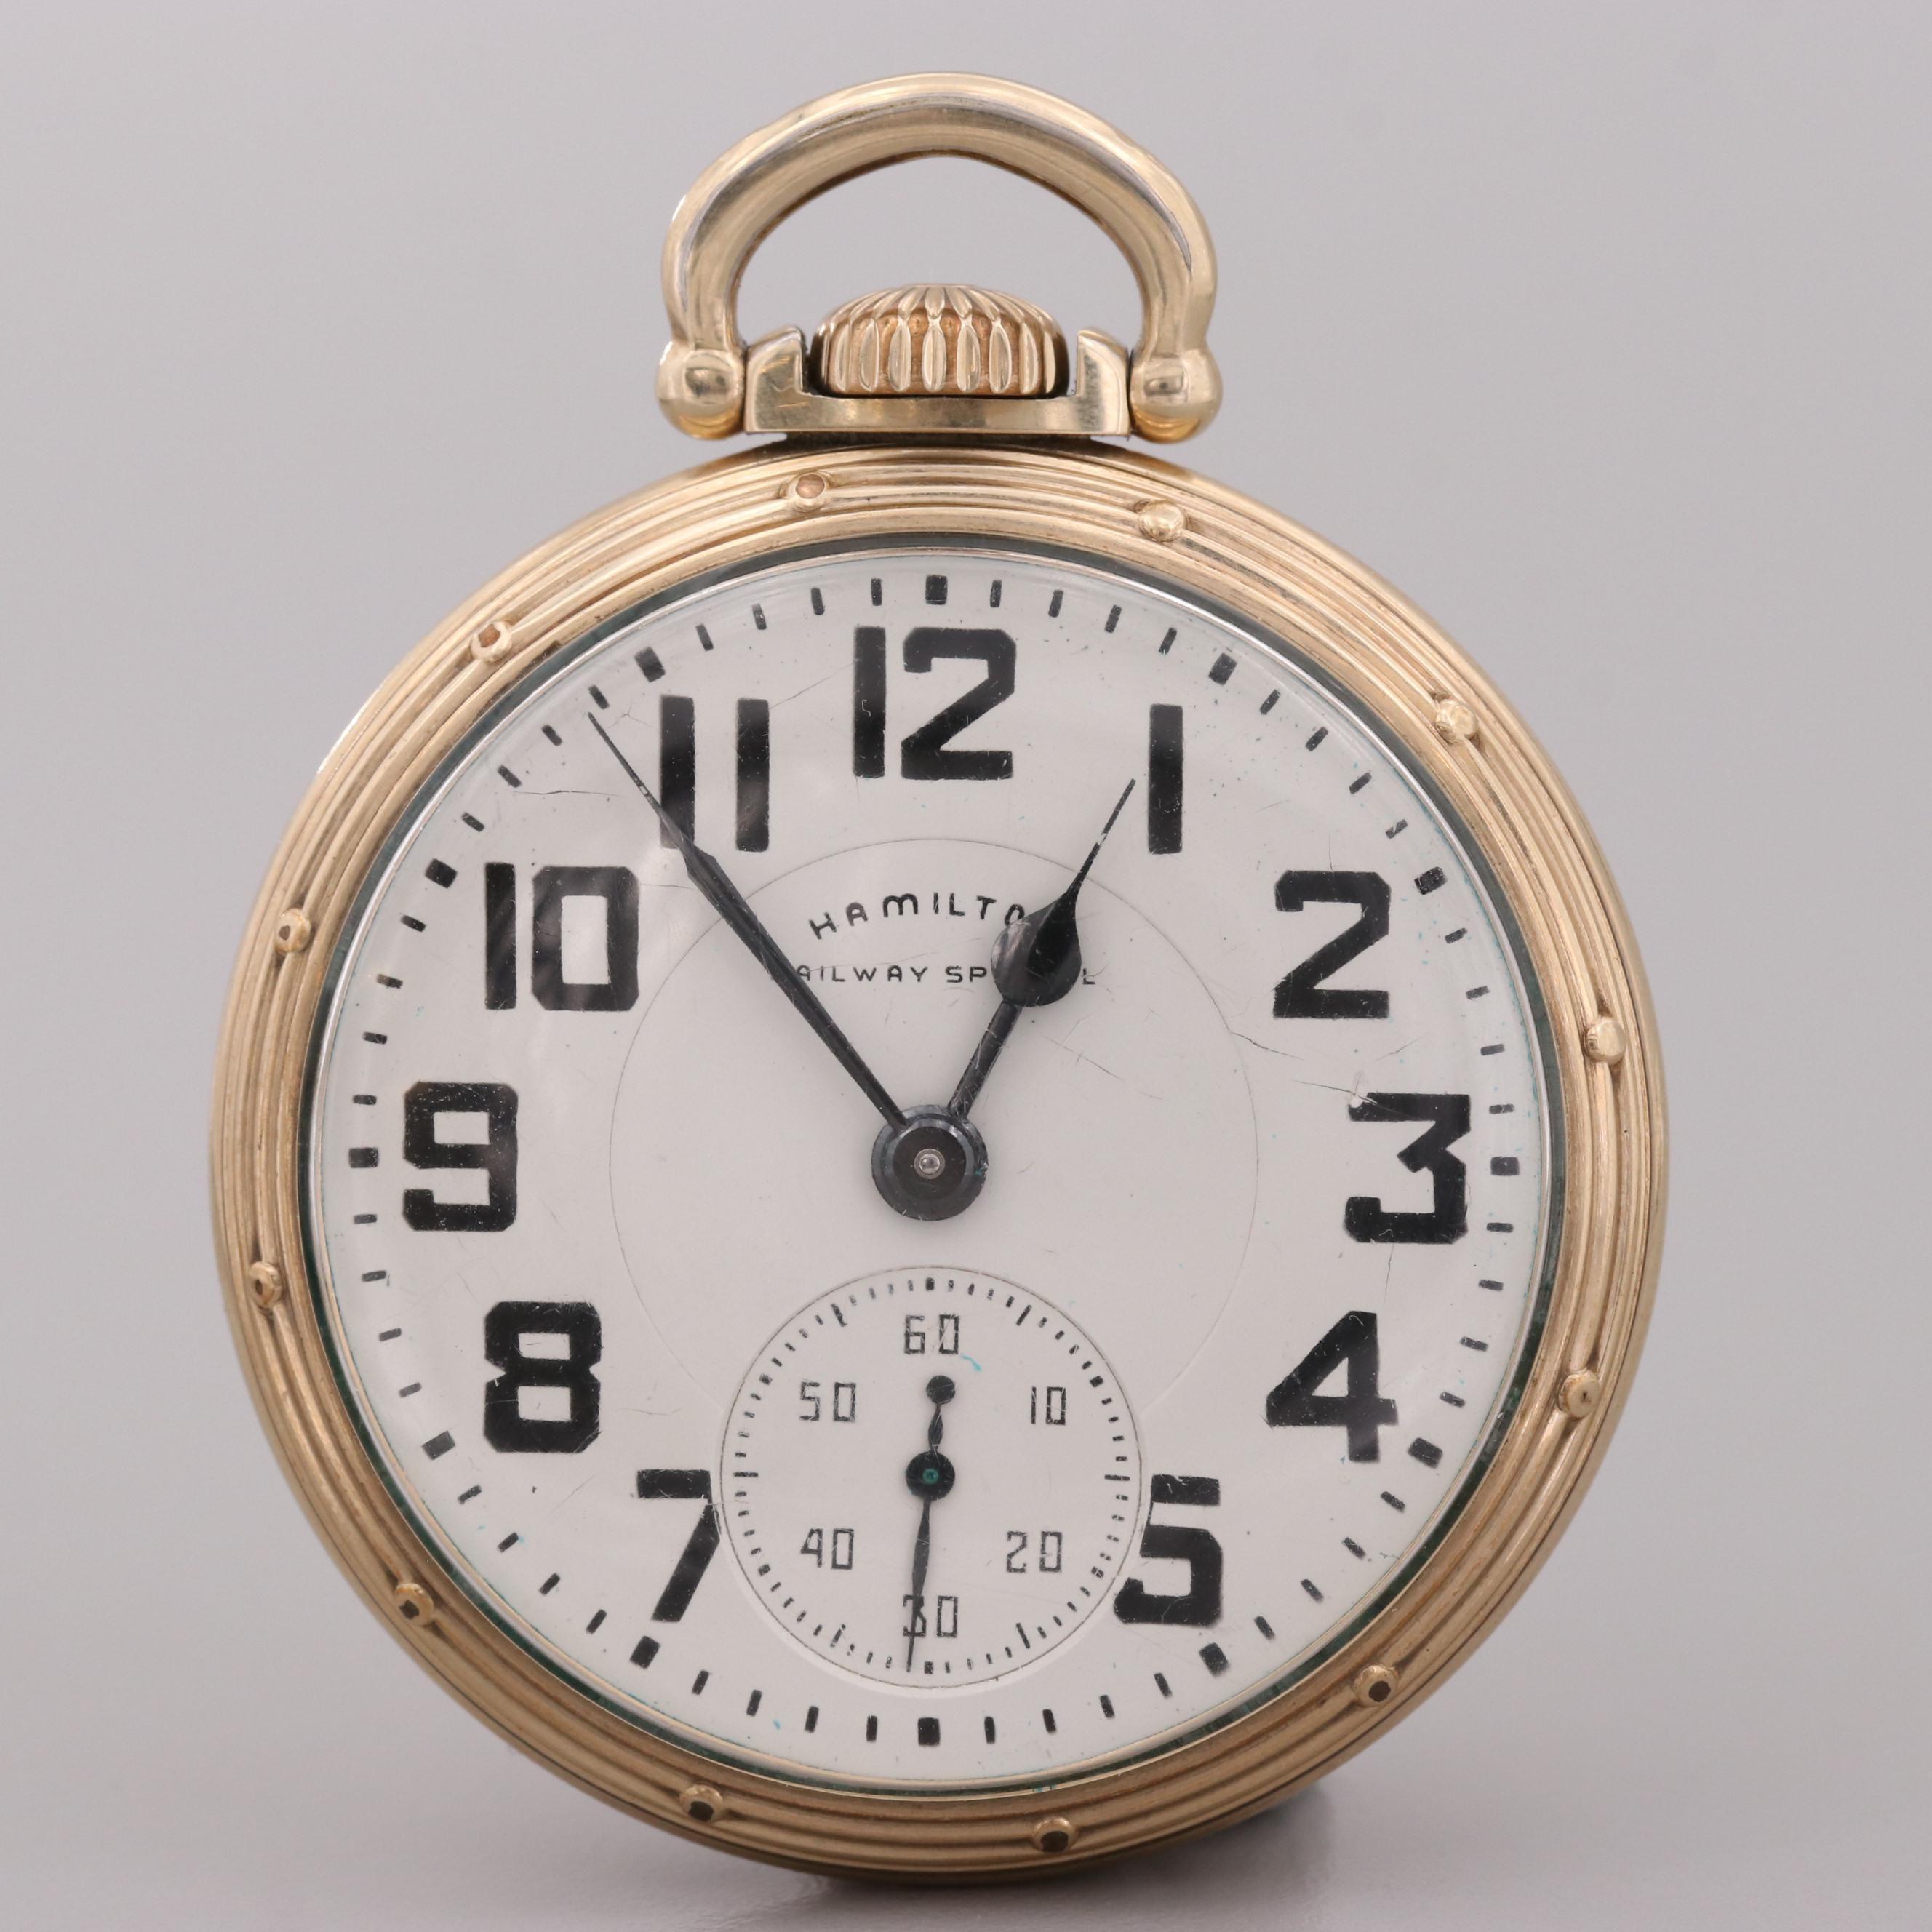 Hamilton Railway Special 10K Gold Filled Pocket Watch, 1952